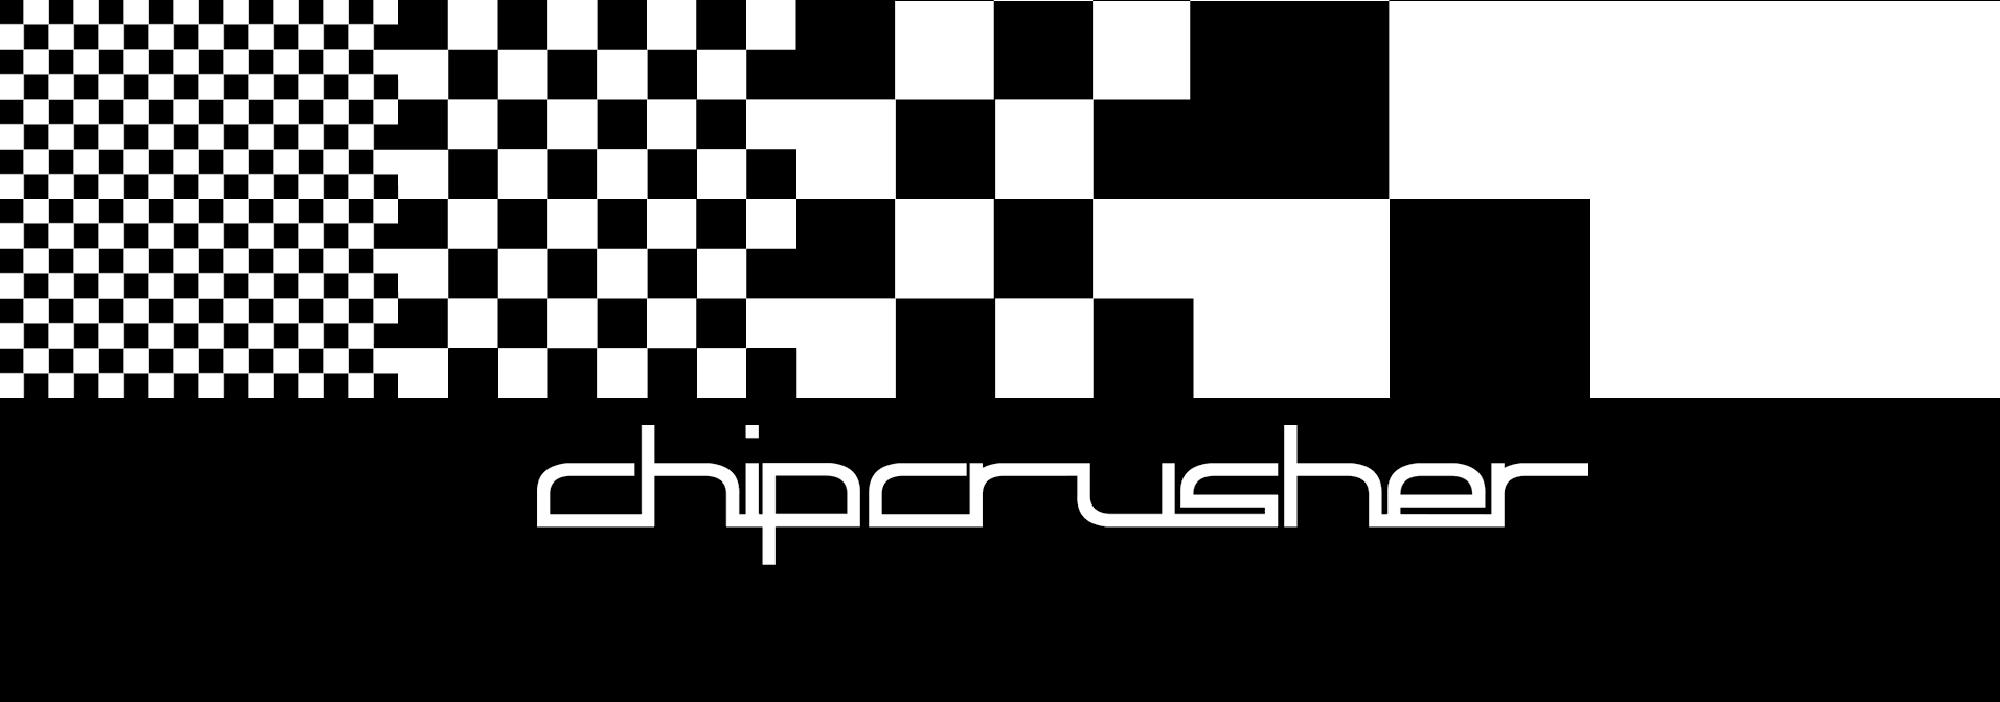 chipcrusher